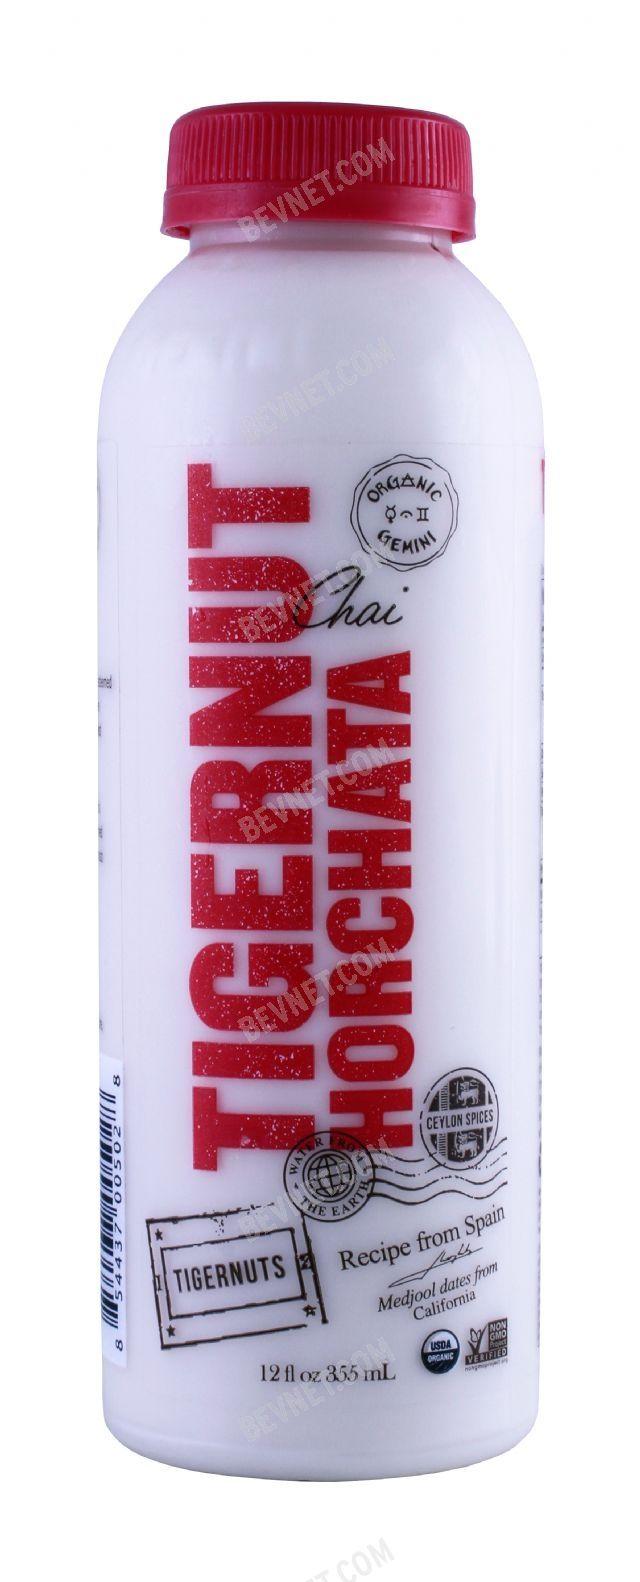 Tigernut Horchata: